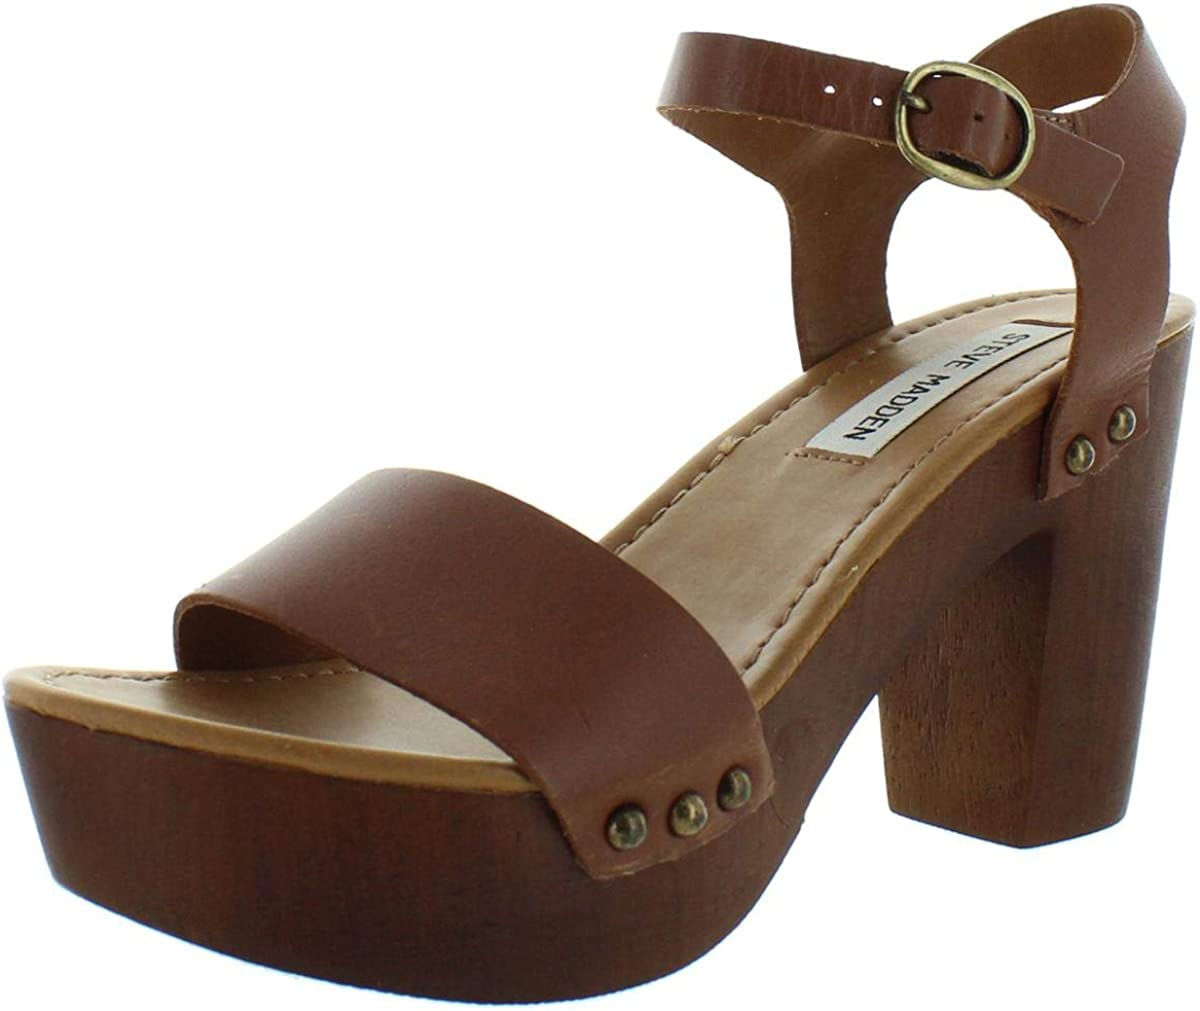 heroico Laboratorio Premisa  Steve Madden Luna Women's Sandal 7 B(M) US Cognac: Amazon.ca: Shoes &  Handbags